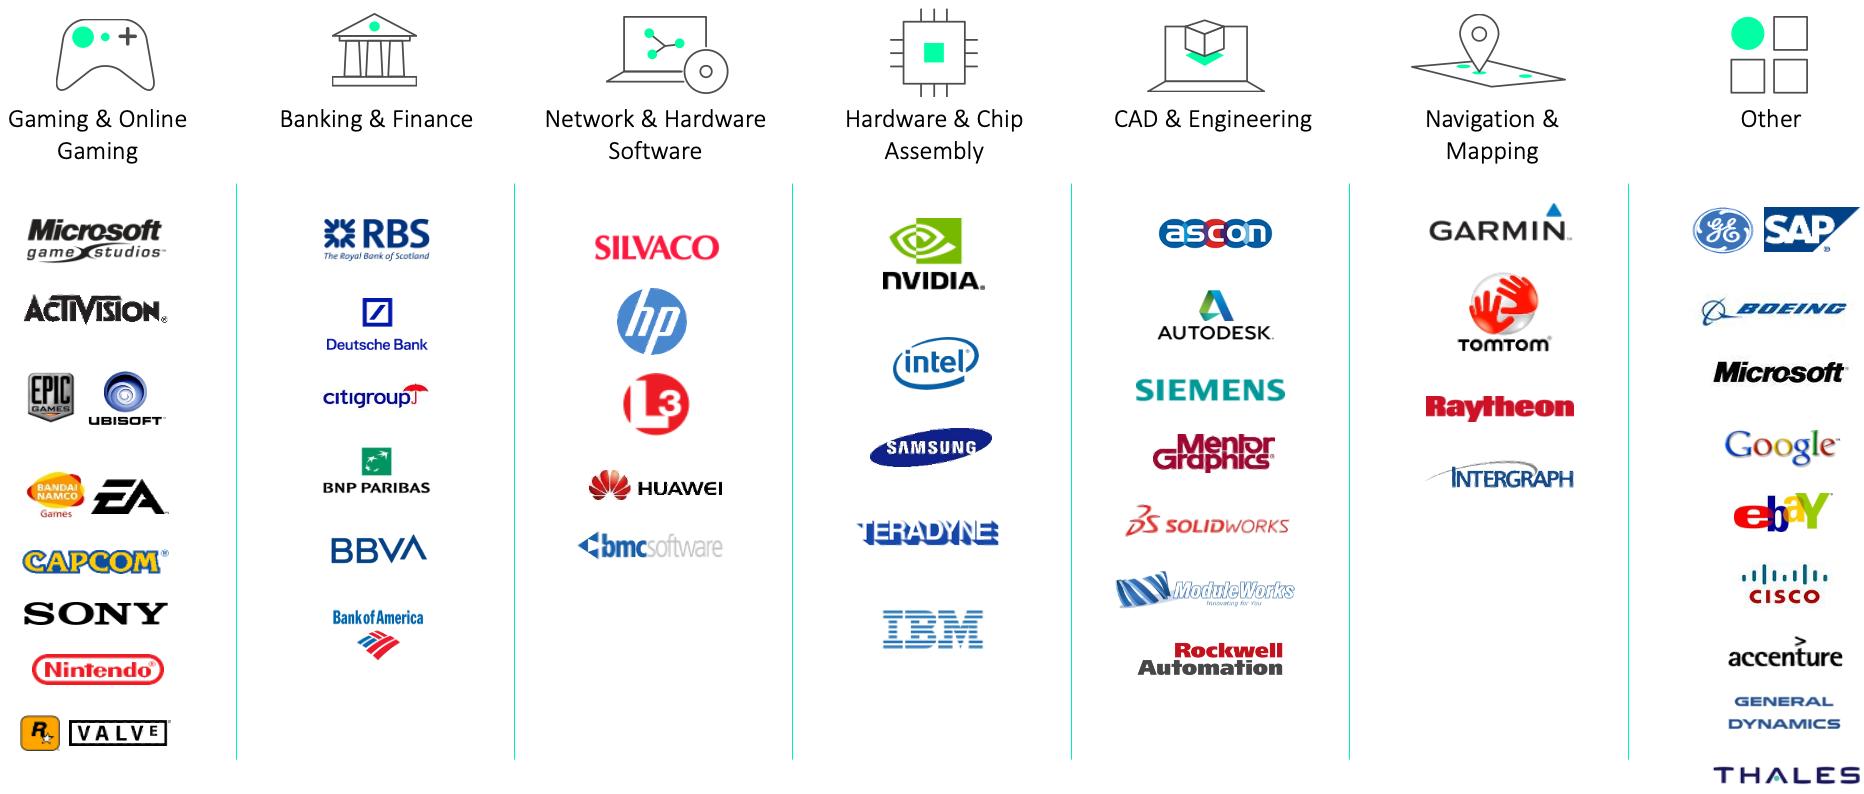 Incredibuild Customer Overview